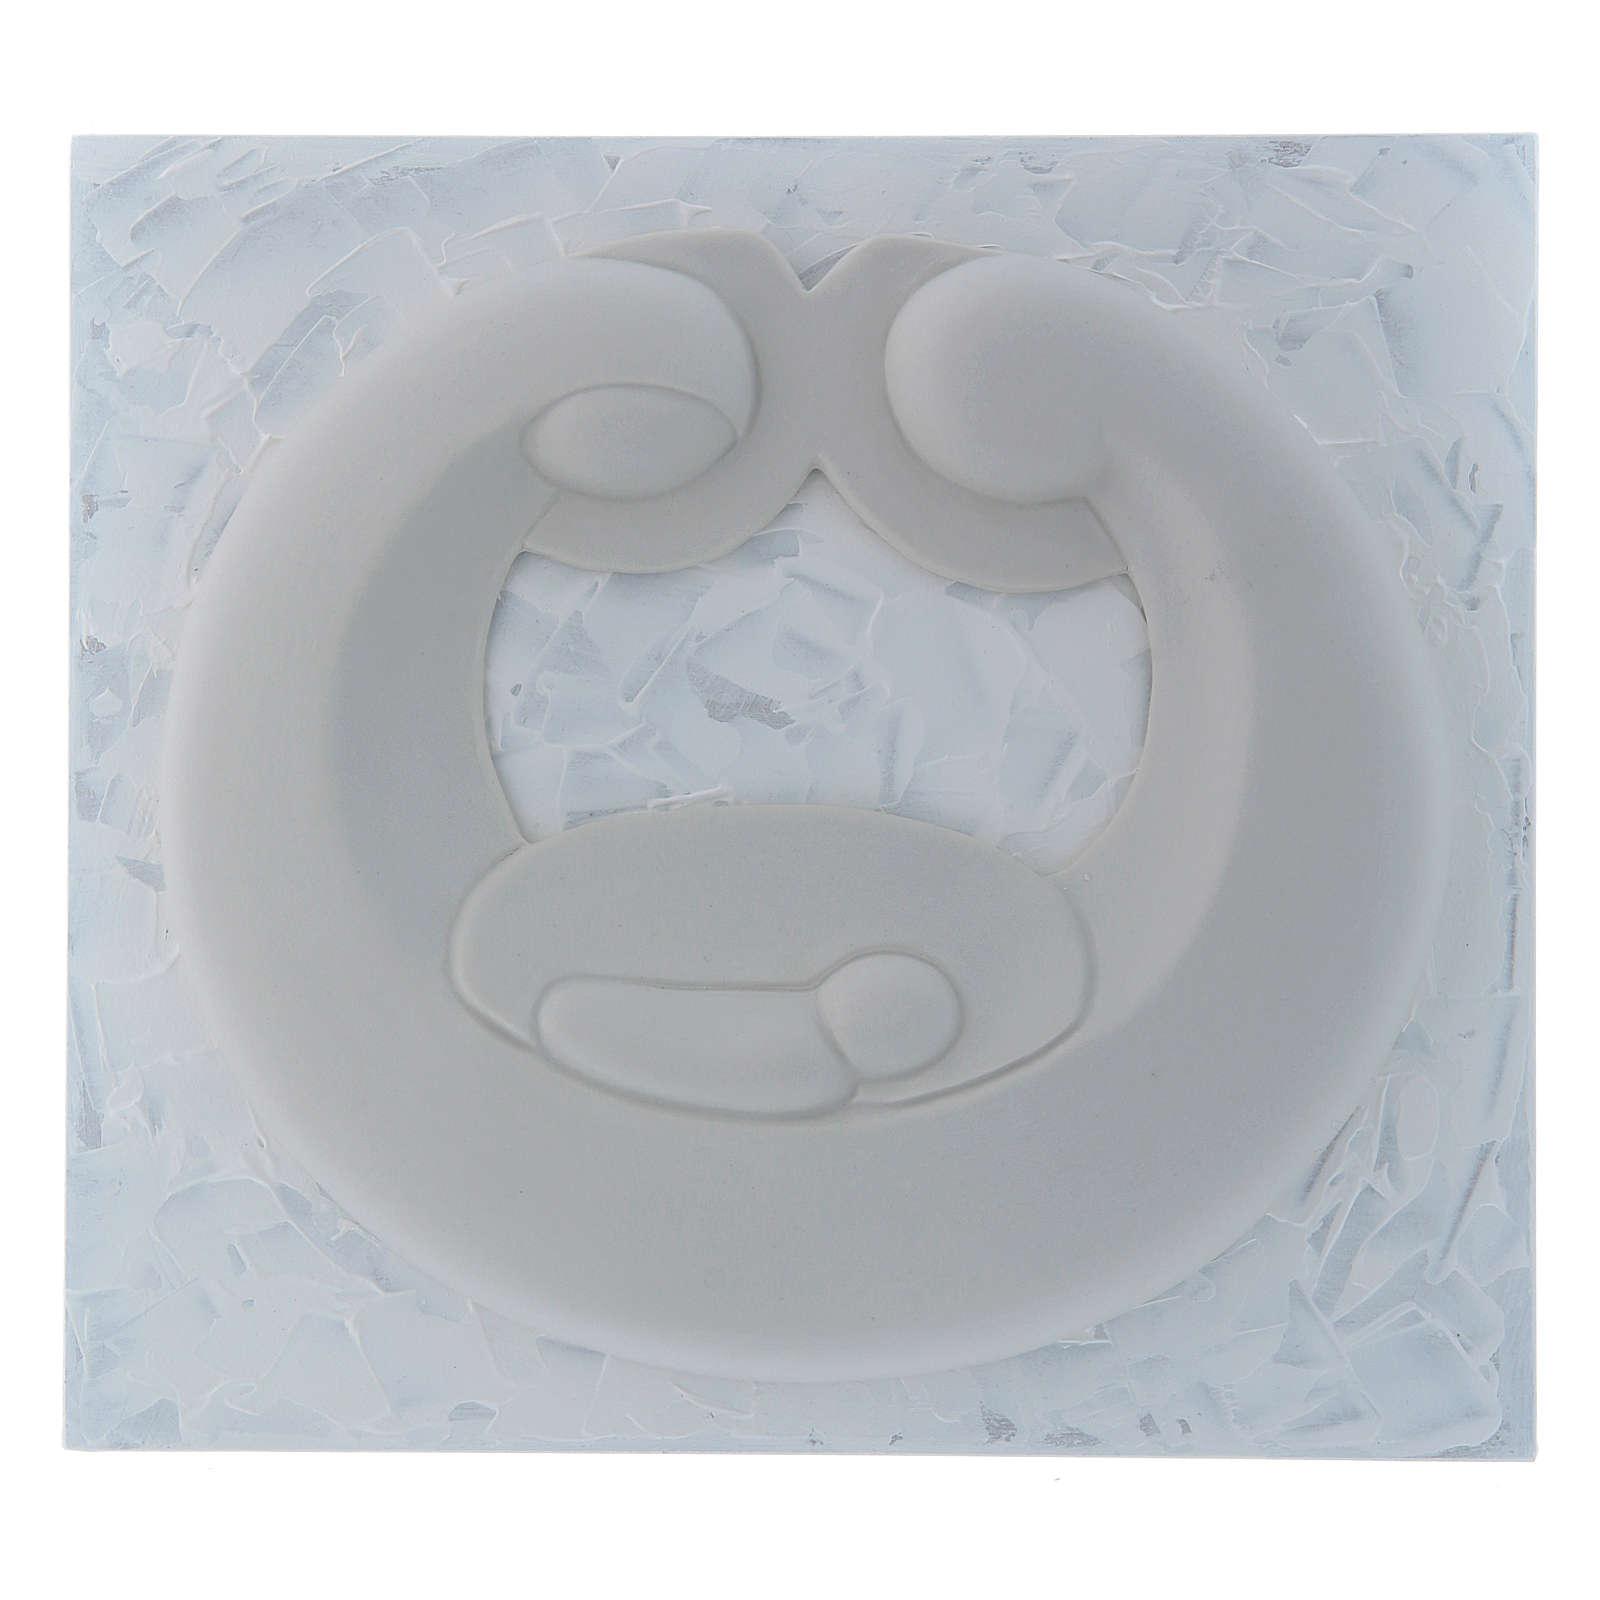 Bajorrelieve Pinton Sagrada Familia porcelana blanca en panel blanco 22x25 cm 4